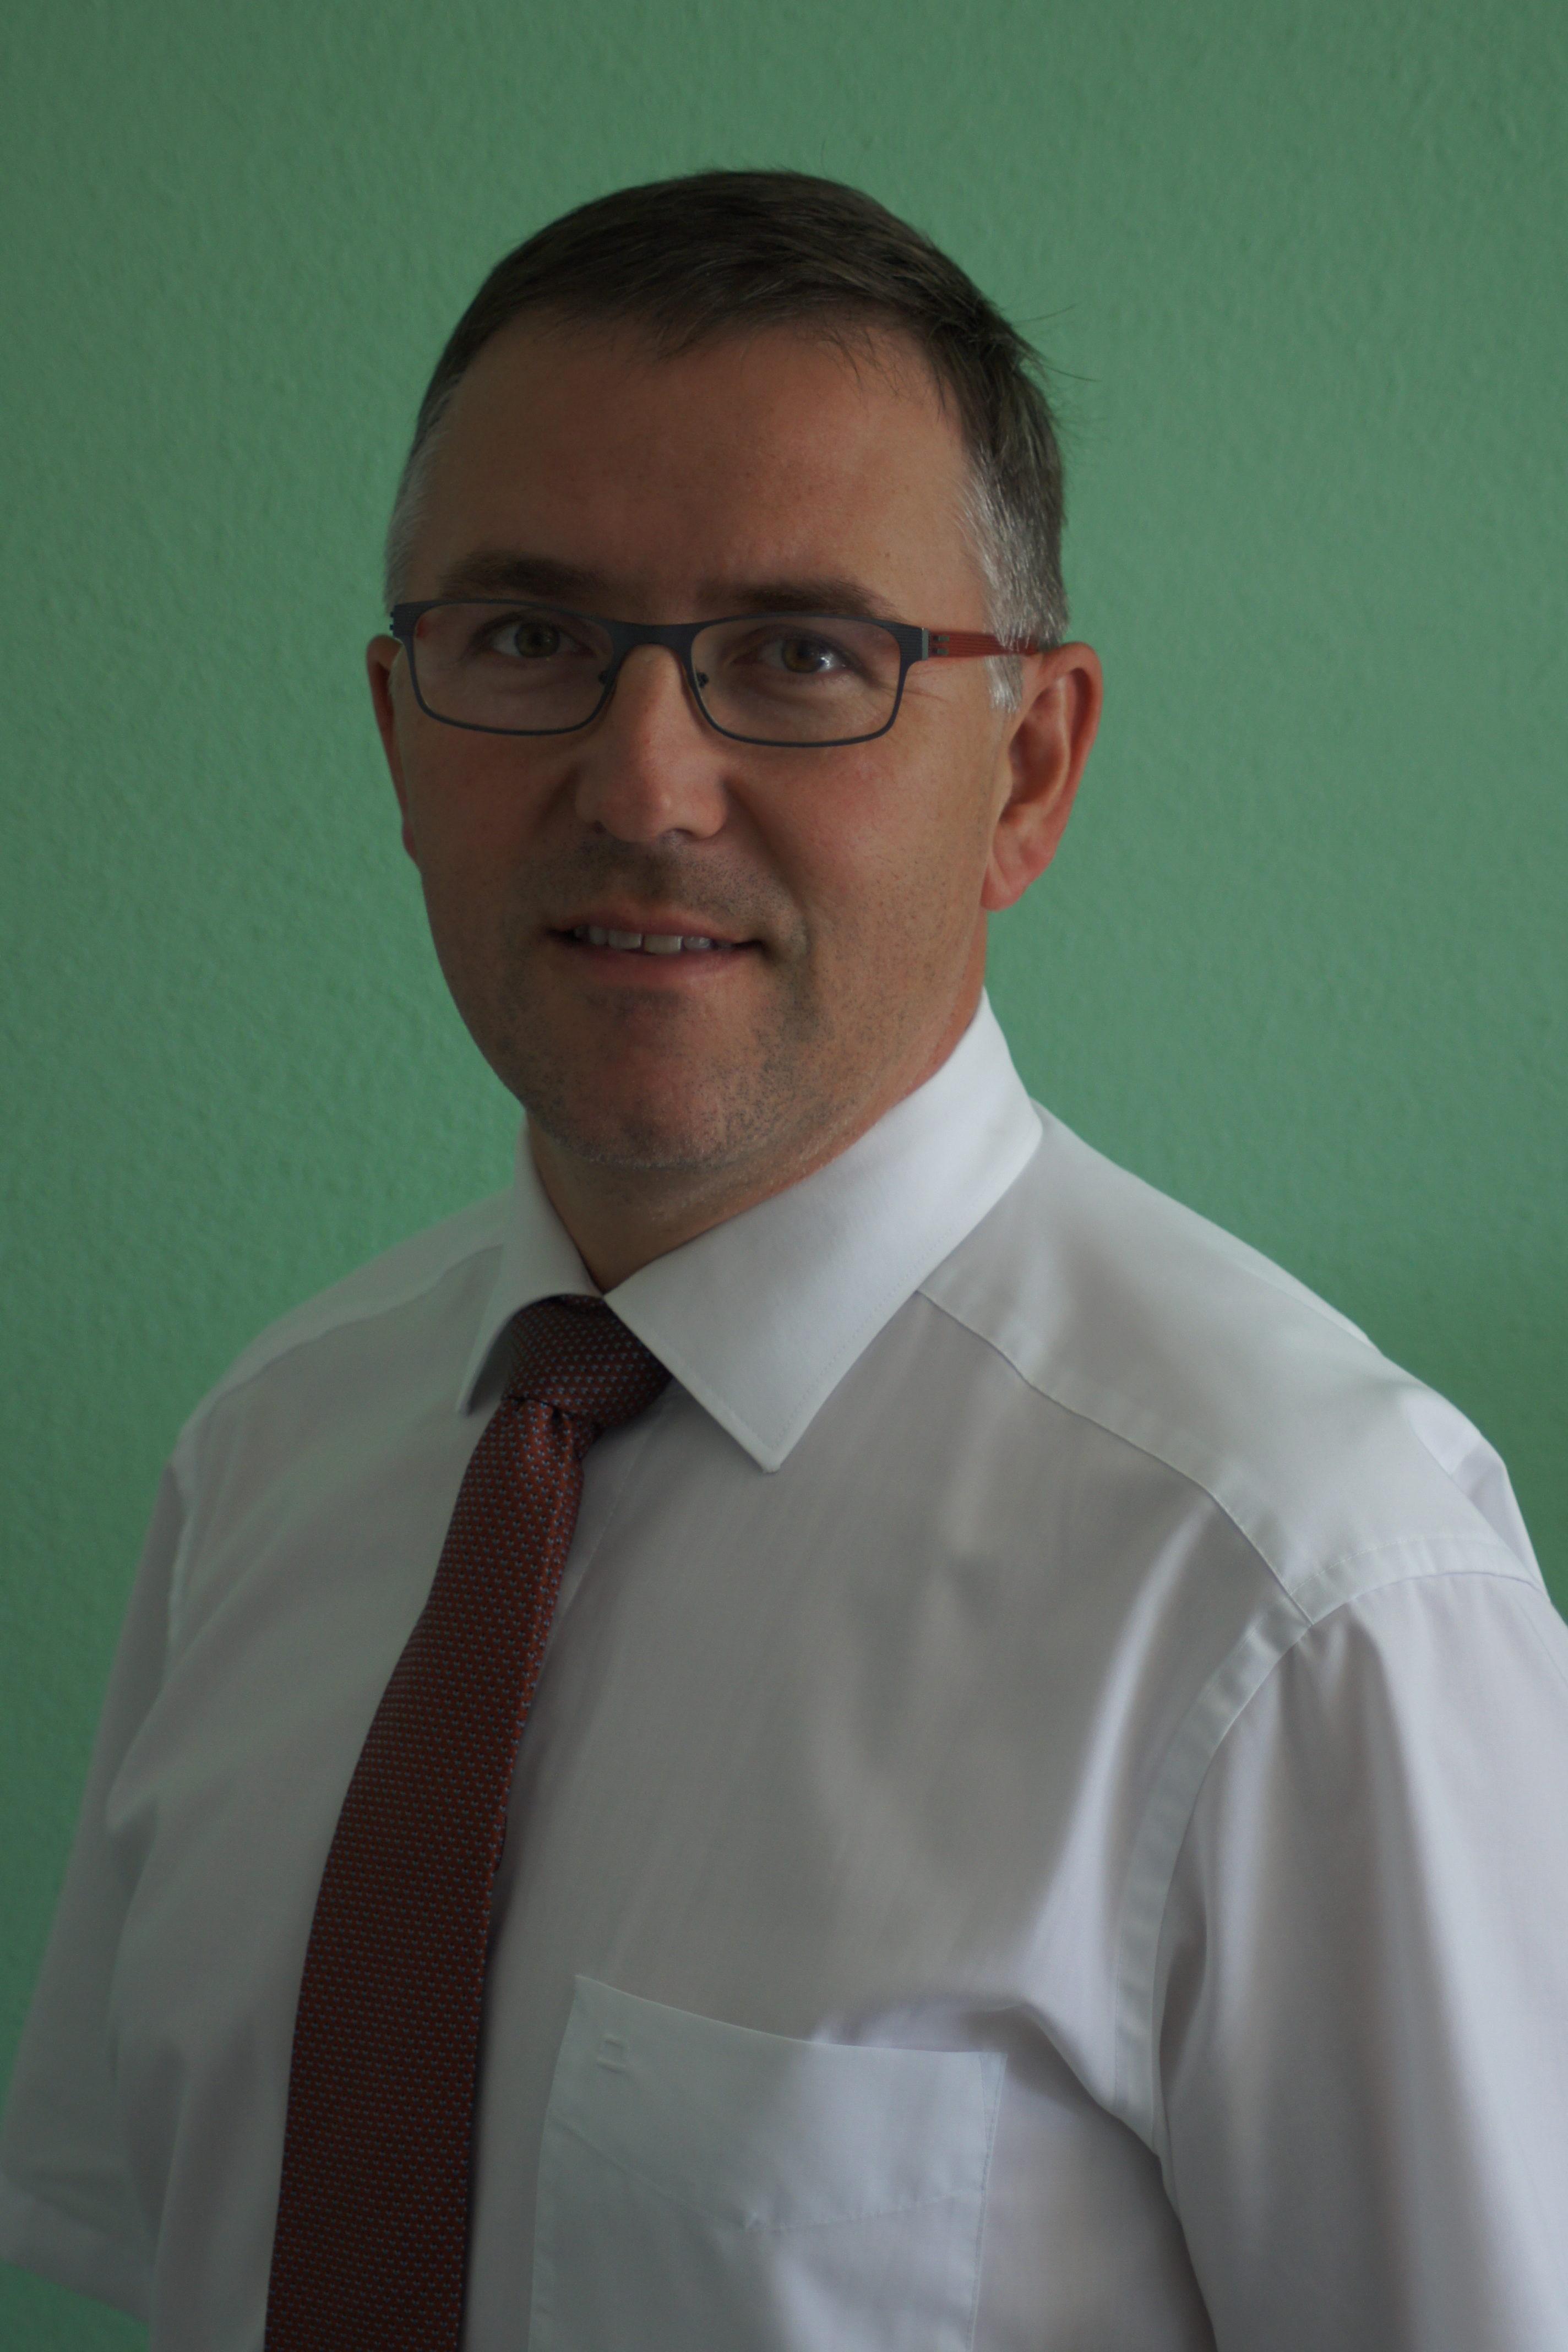 Dr. Michael Dastig